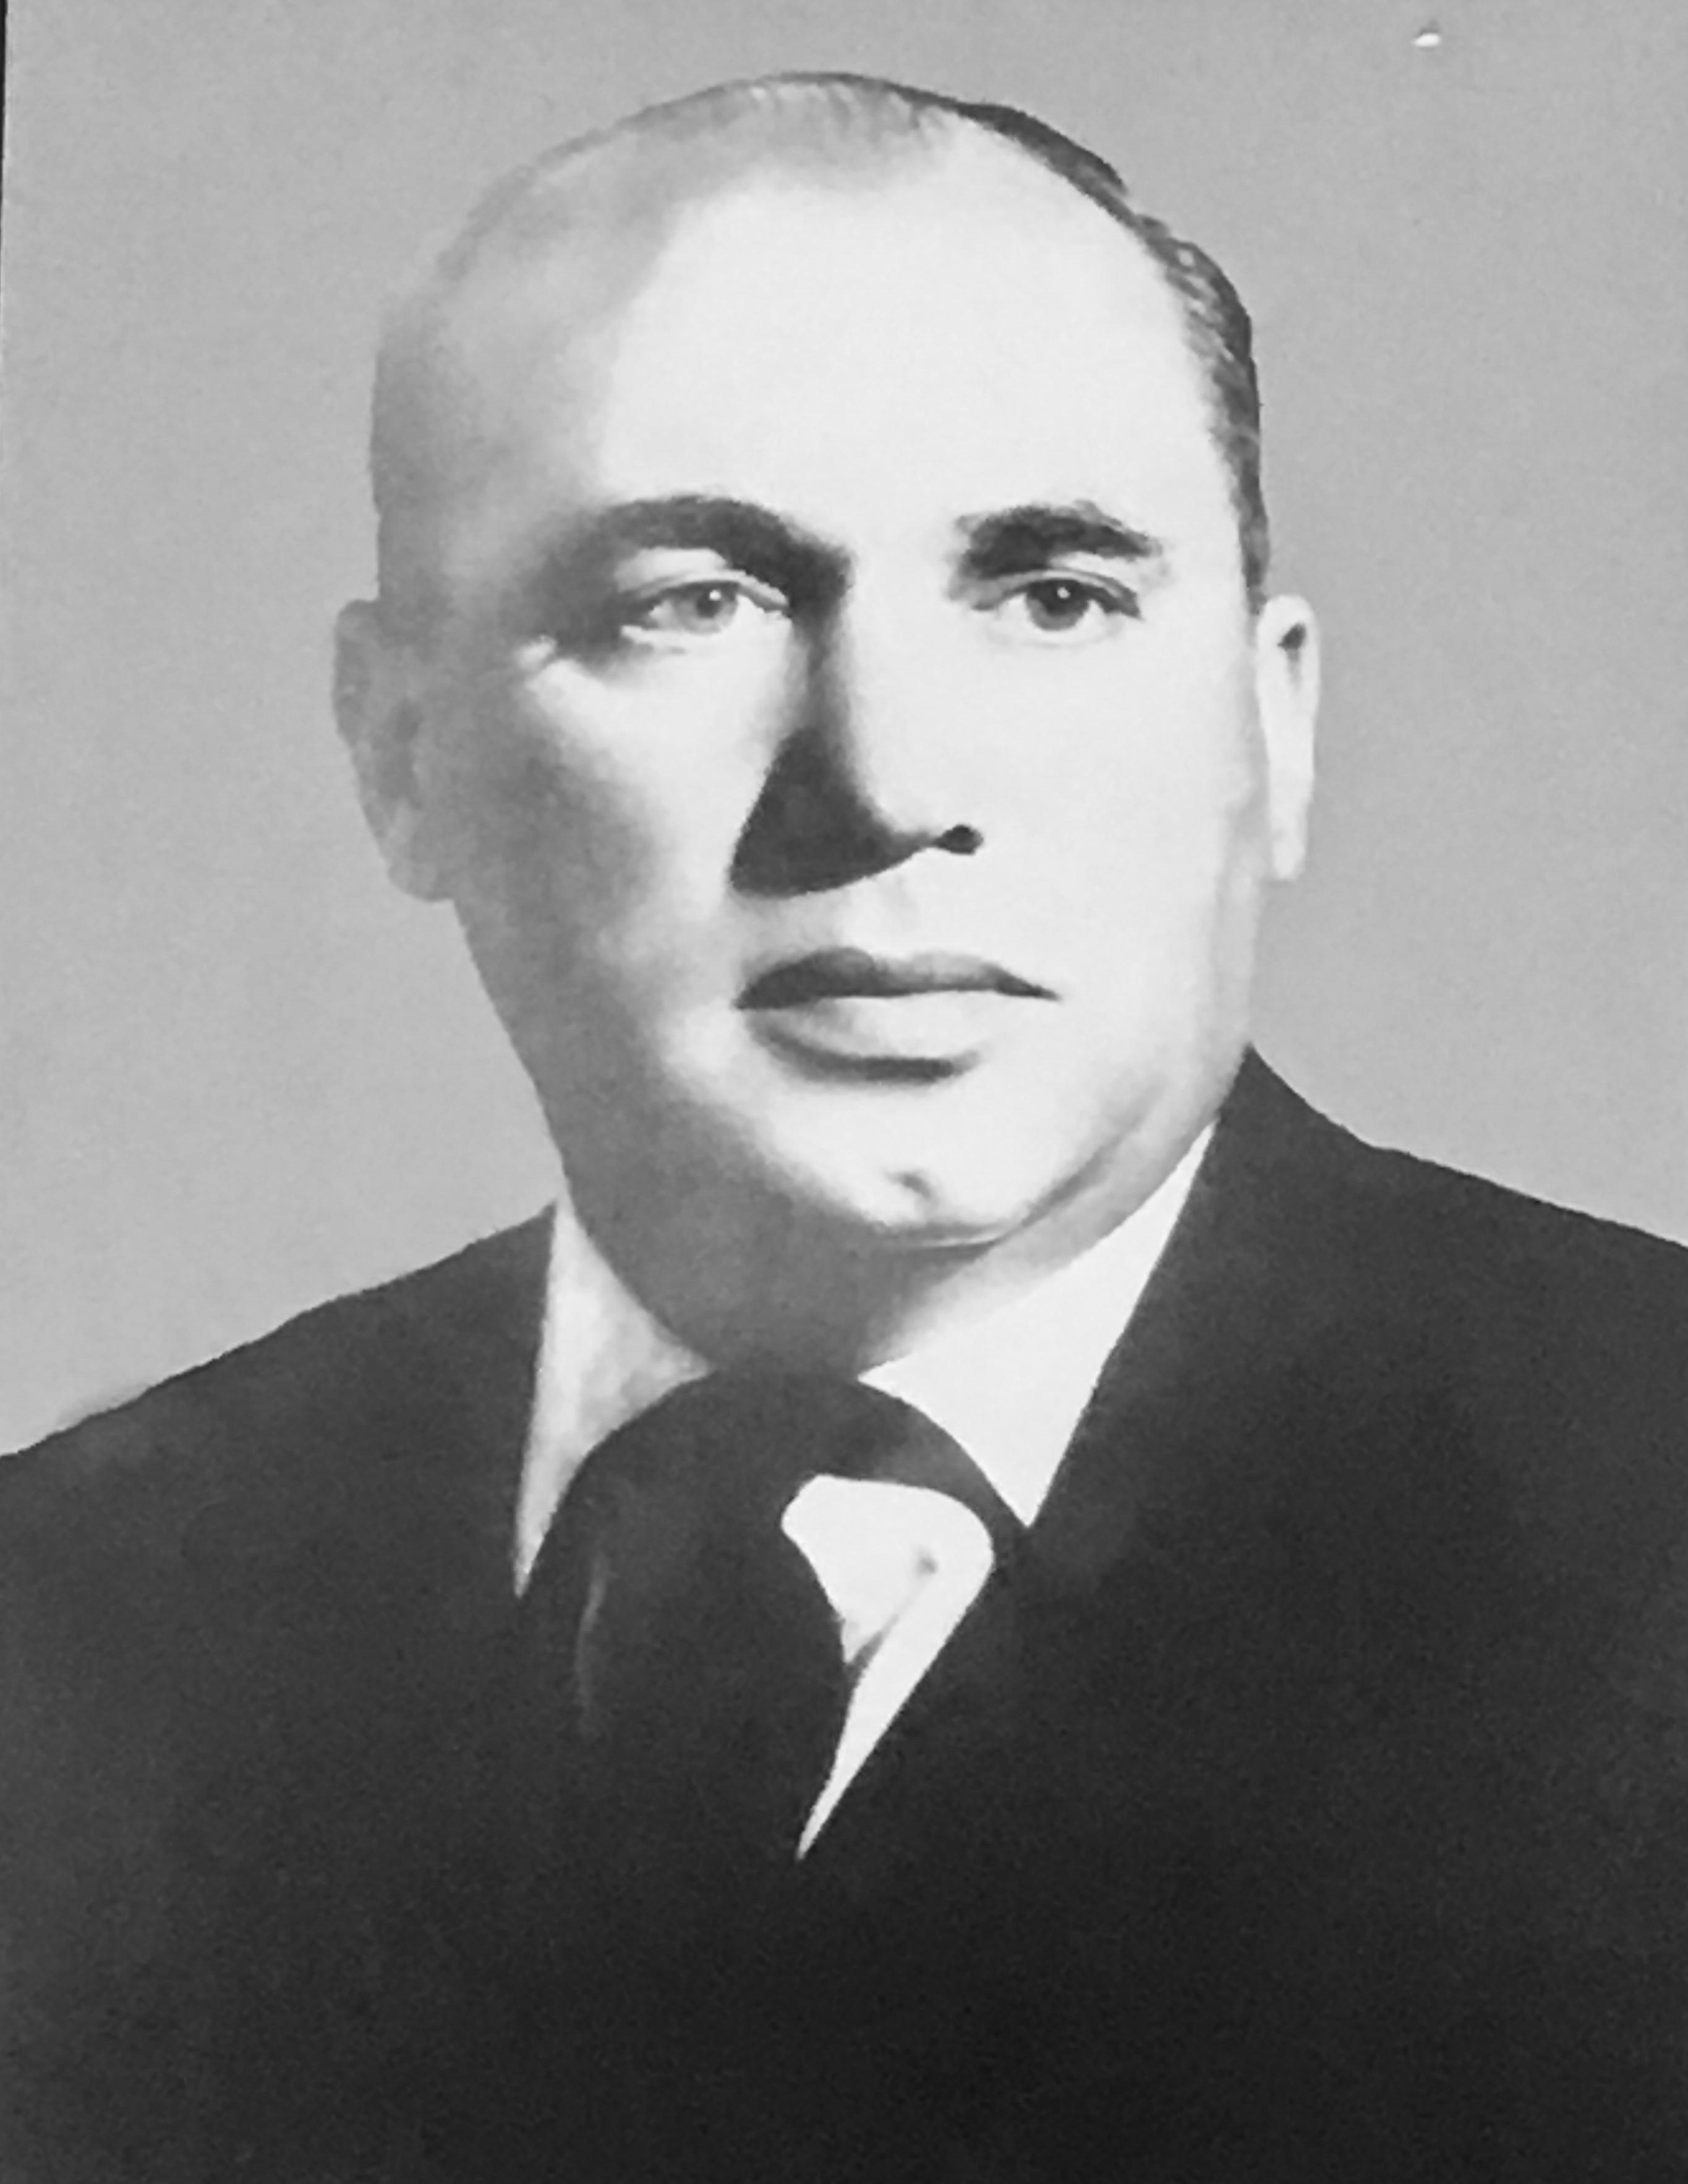 Depiction of Alberto Domingo Montoya